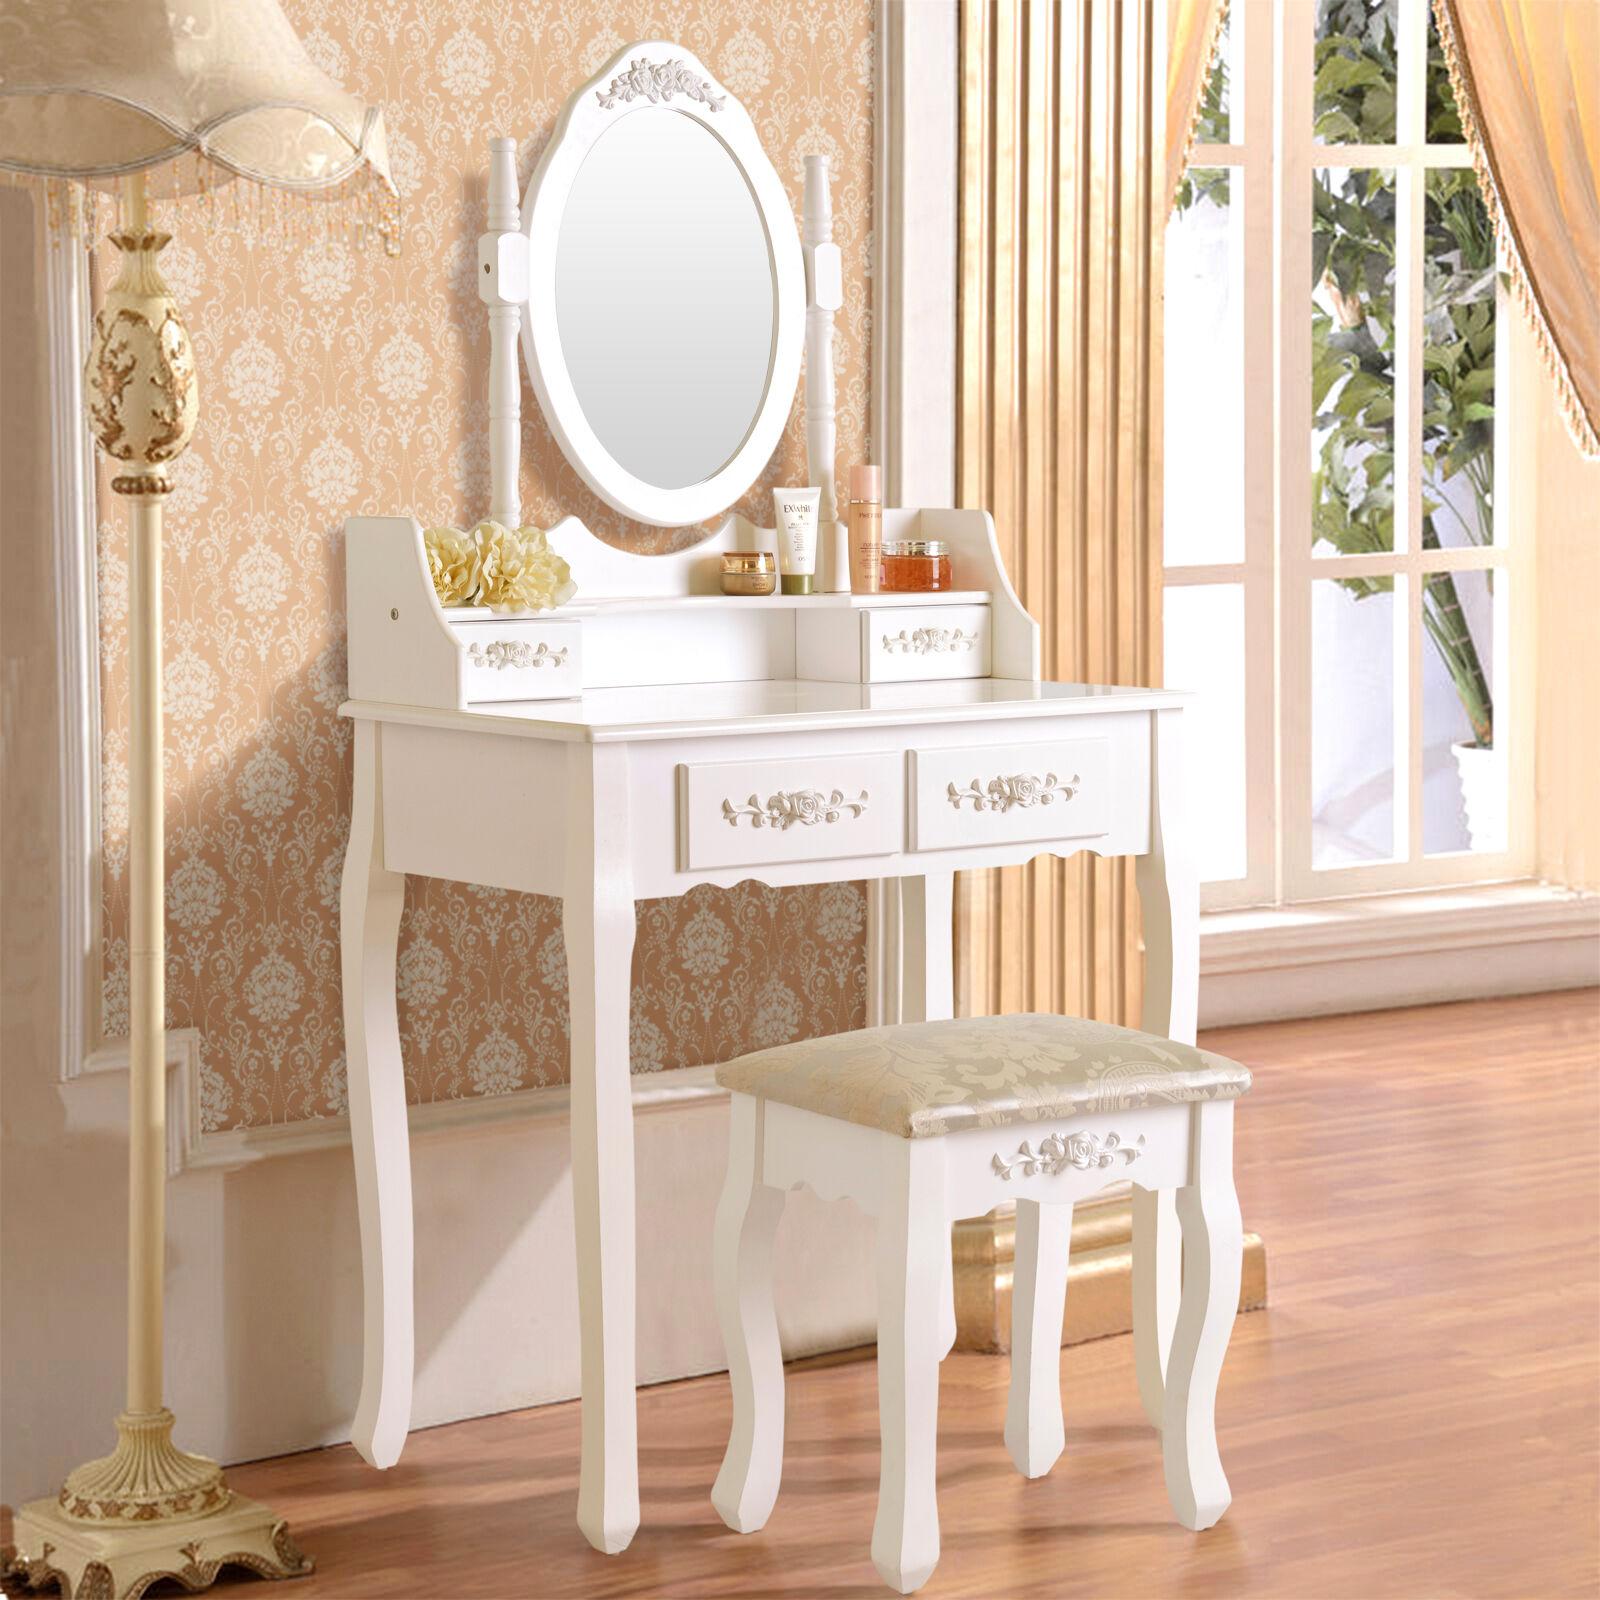 Charmant White Vanity Makeup Dressing Table Set With Stool 4 Drawer U0026 Mirror Wood  Desk